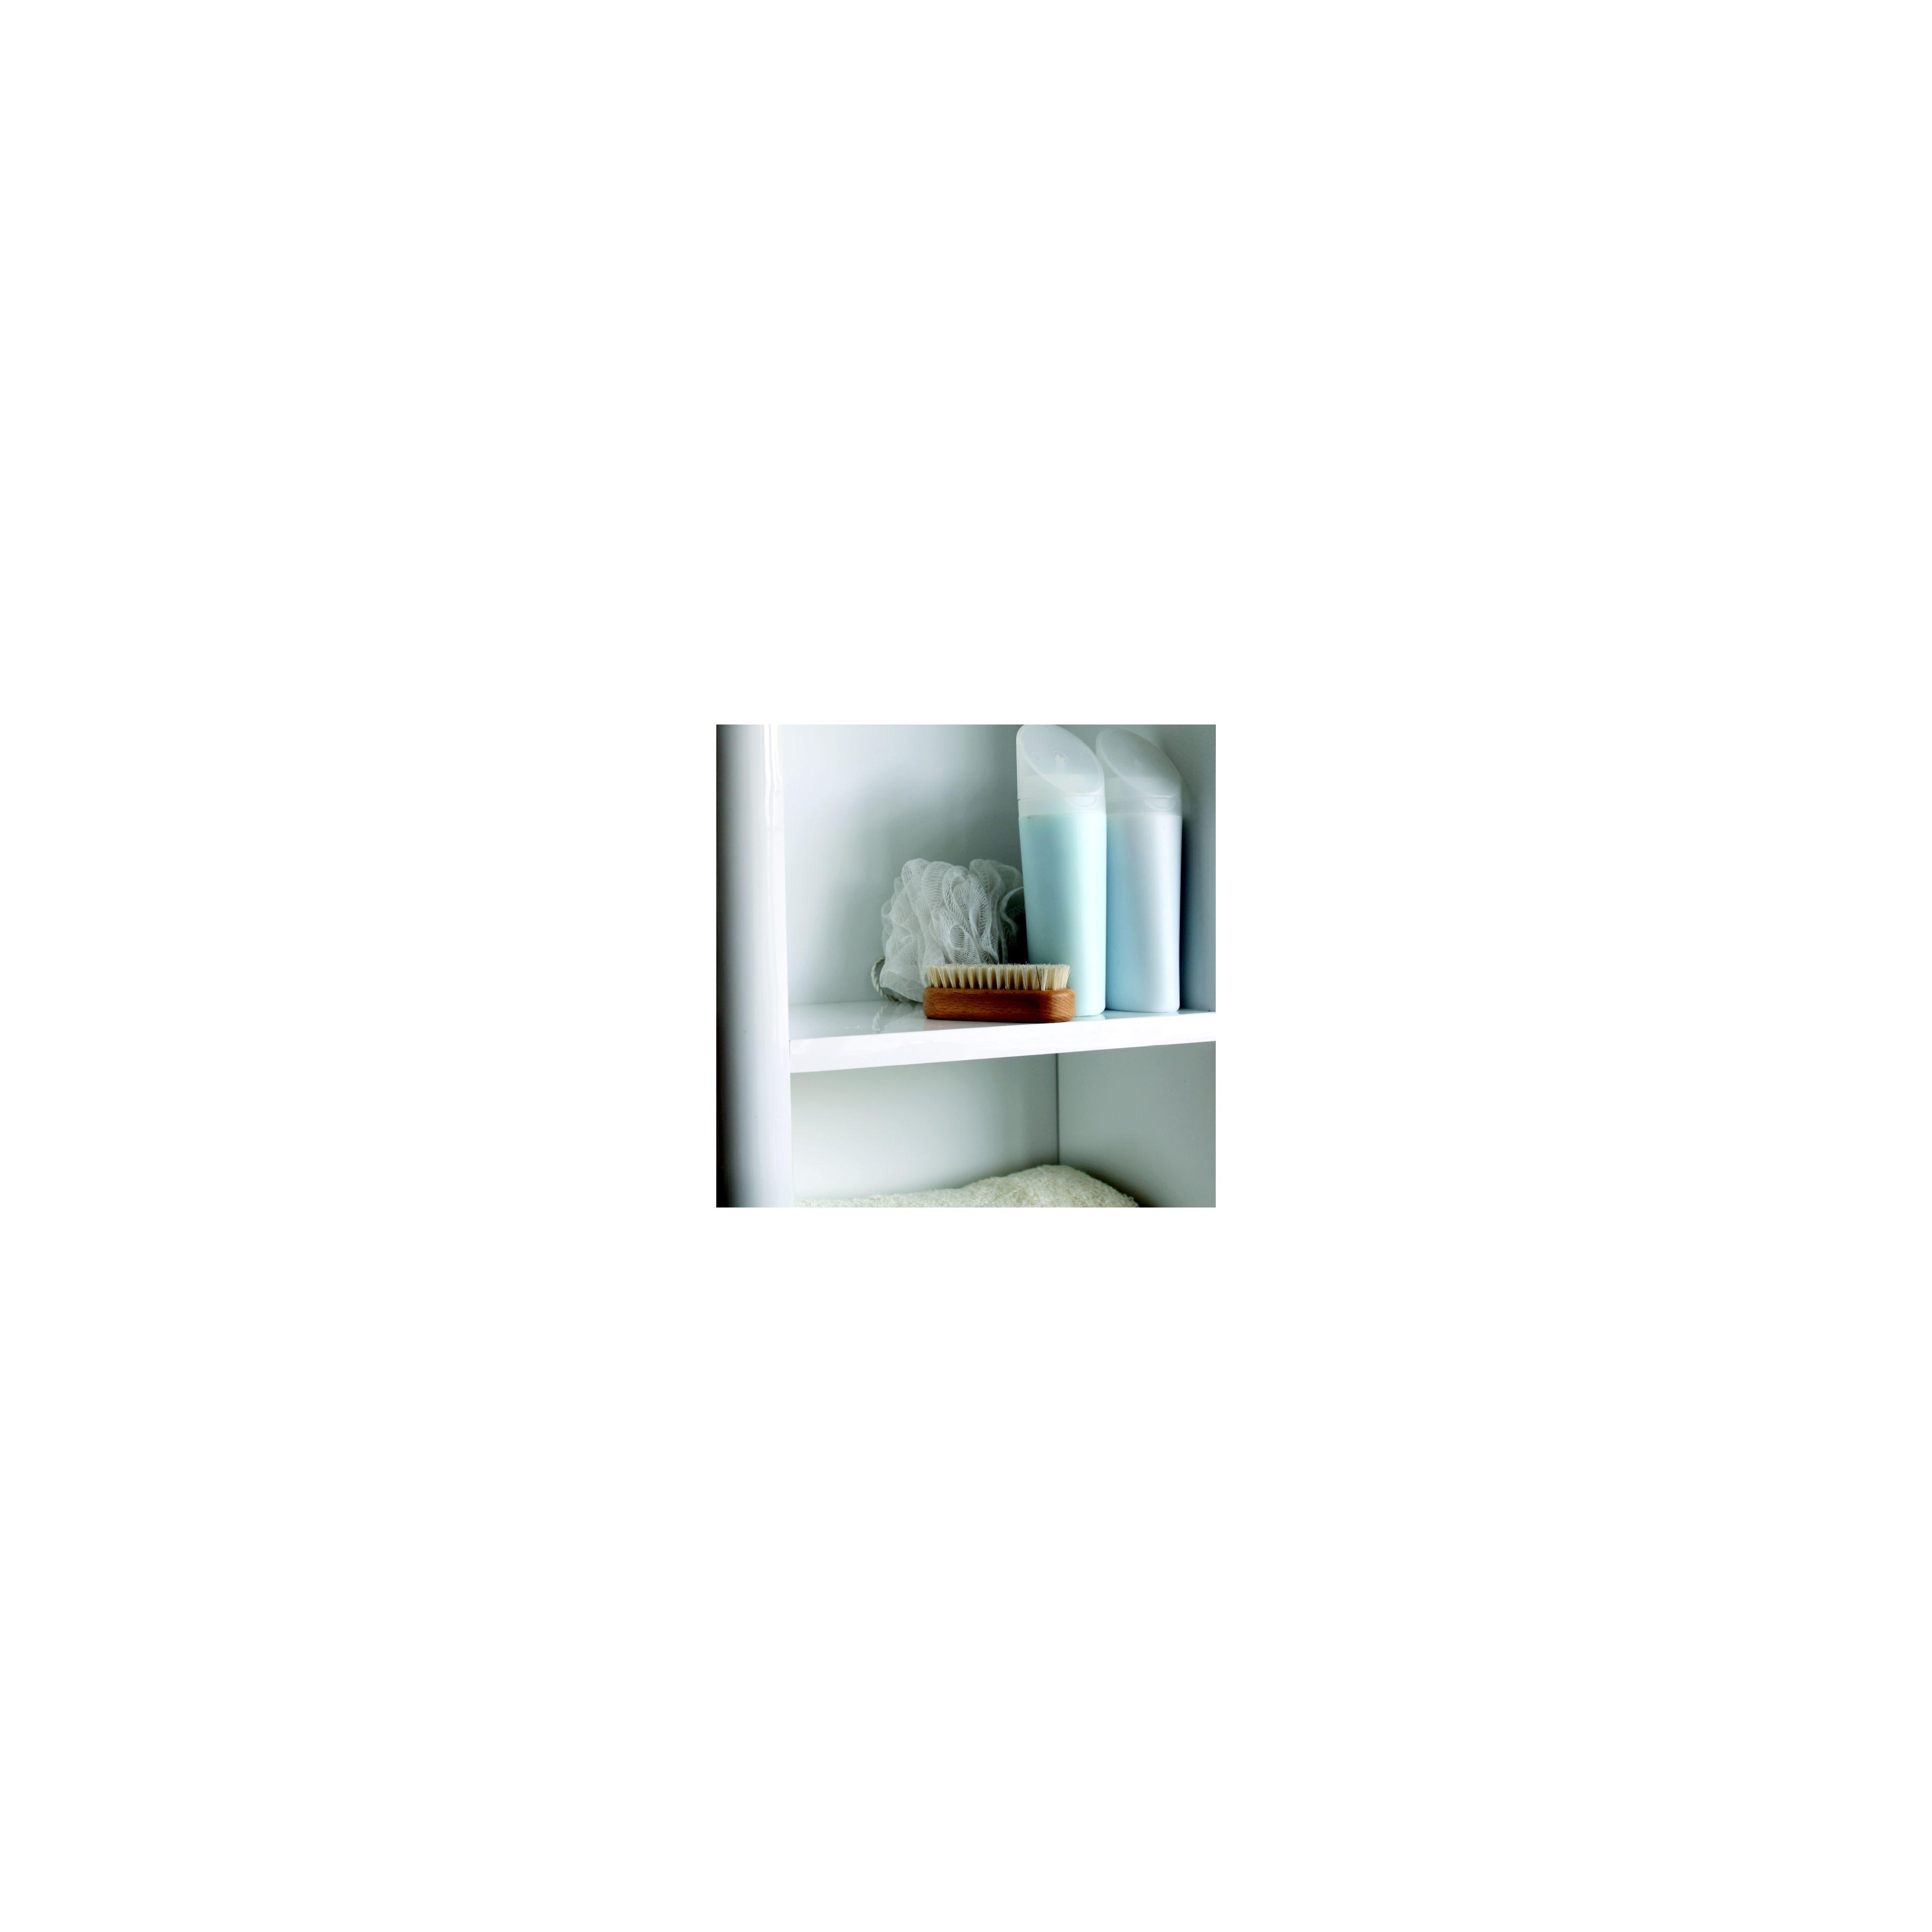 Aliso Tall Boy Bathroom Cabinet - White Gloss